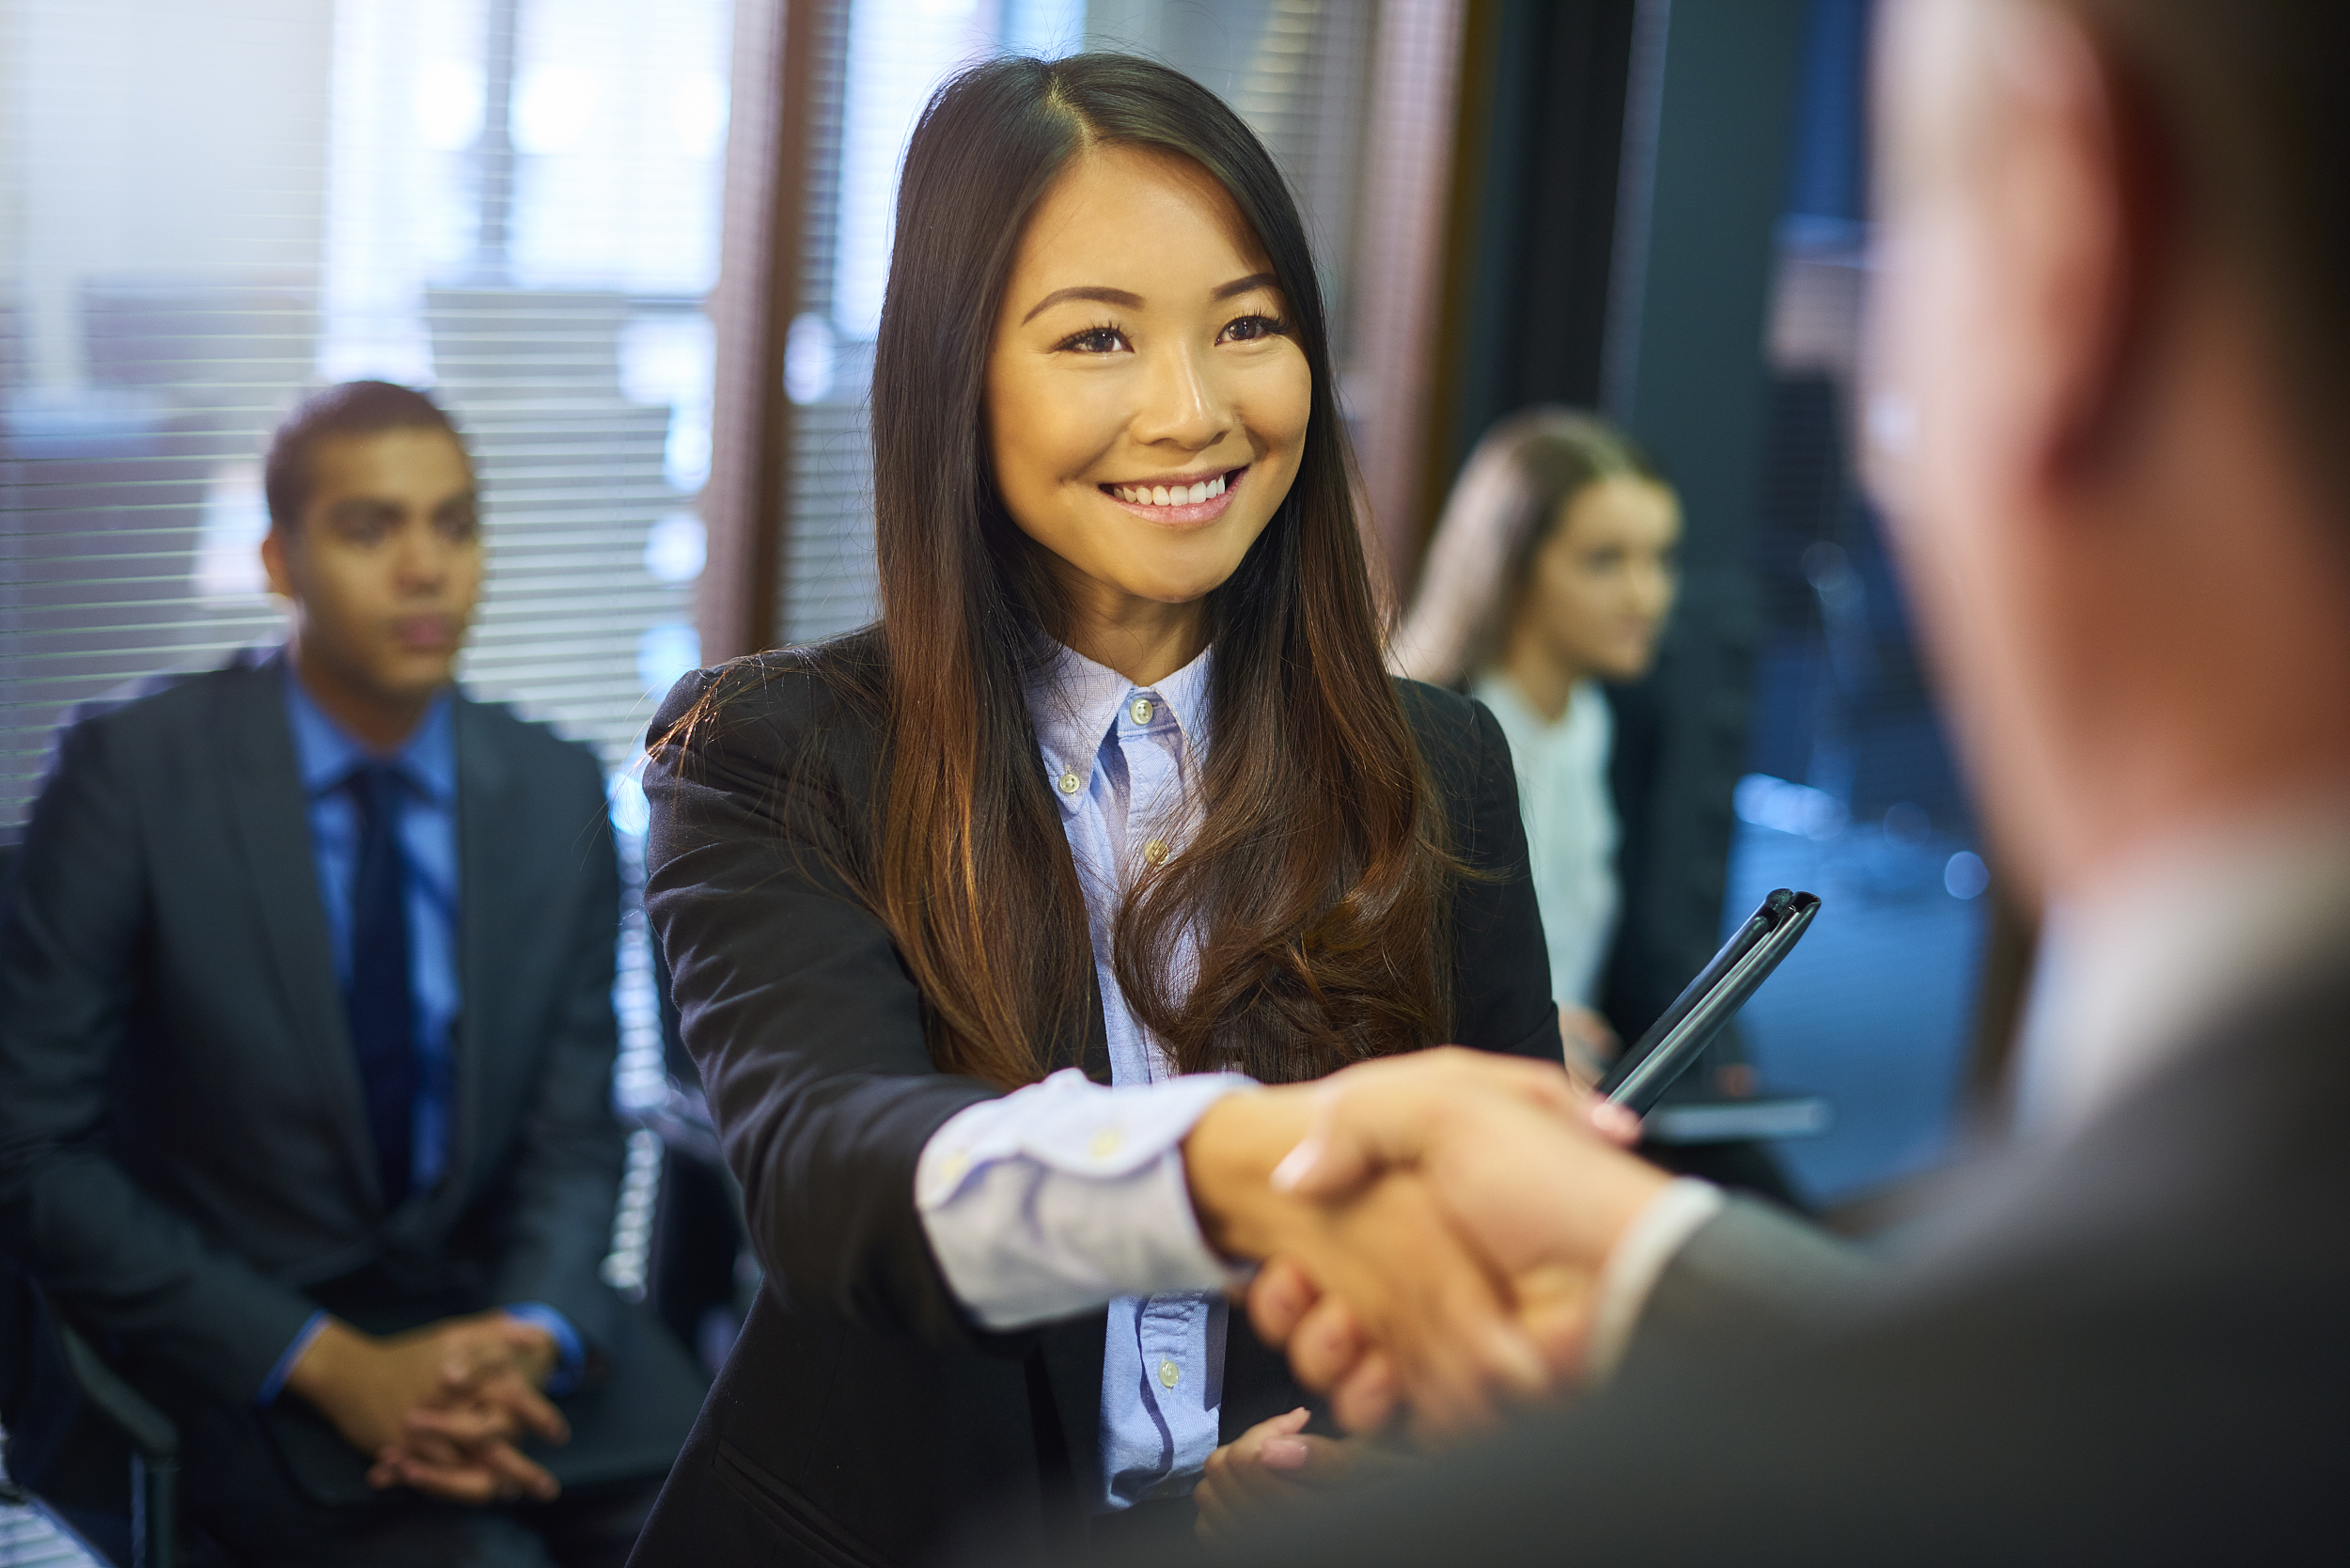 <b>近八成理工科海归毕业前开始求职,求职渠道以</b>